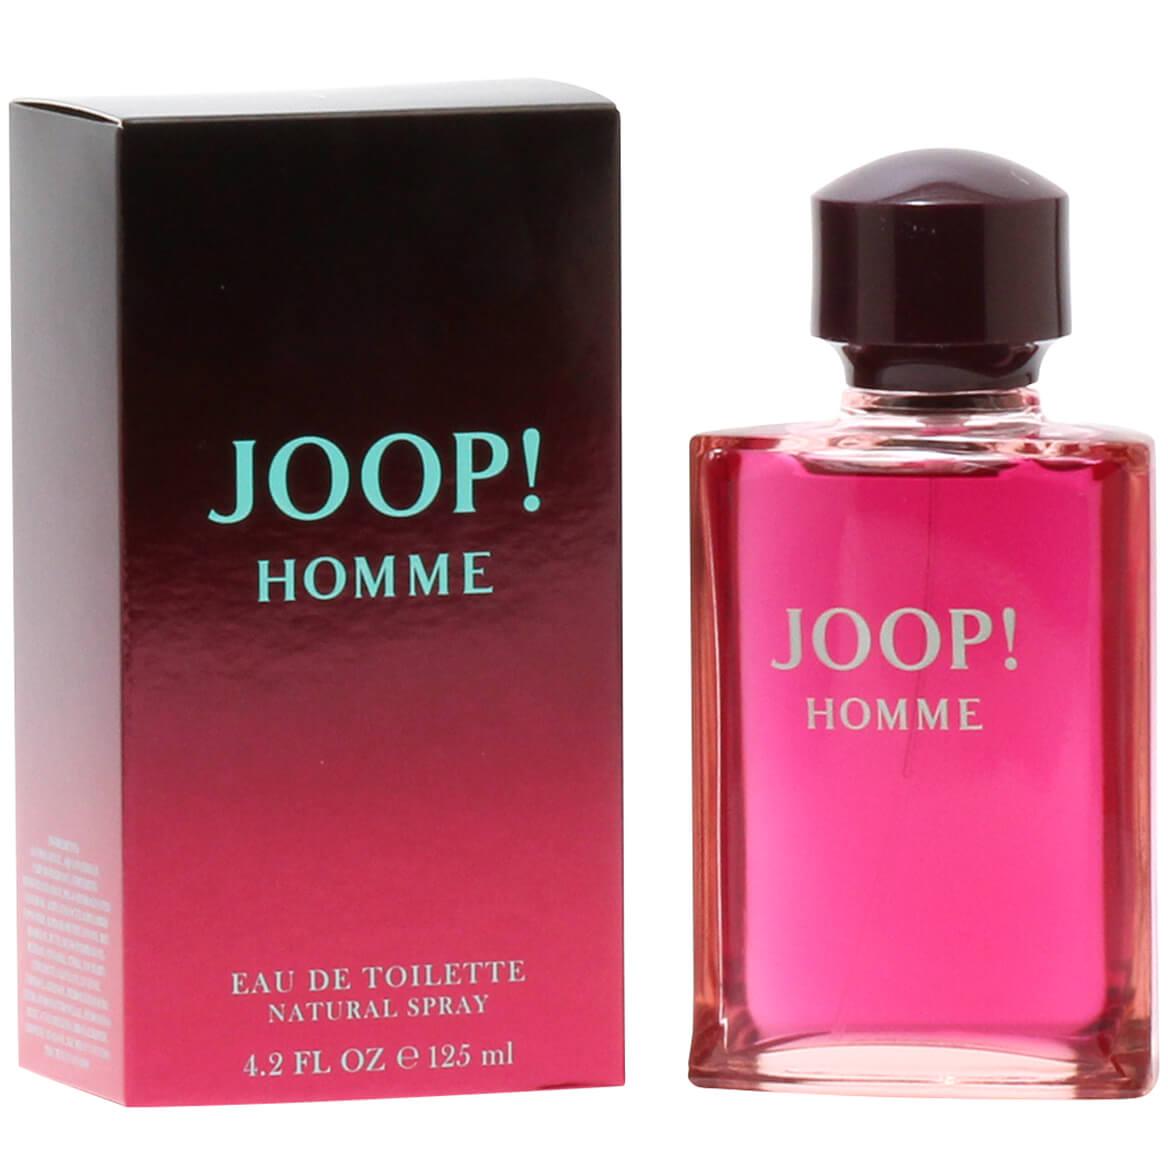 Joop! Homme For Men EDT, 4.2 oz.-366858